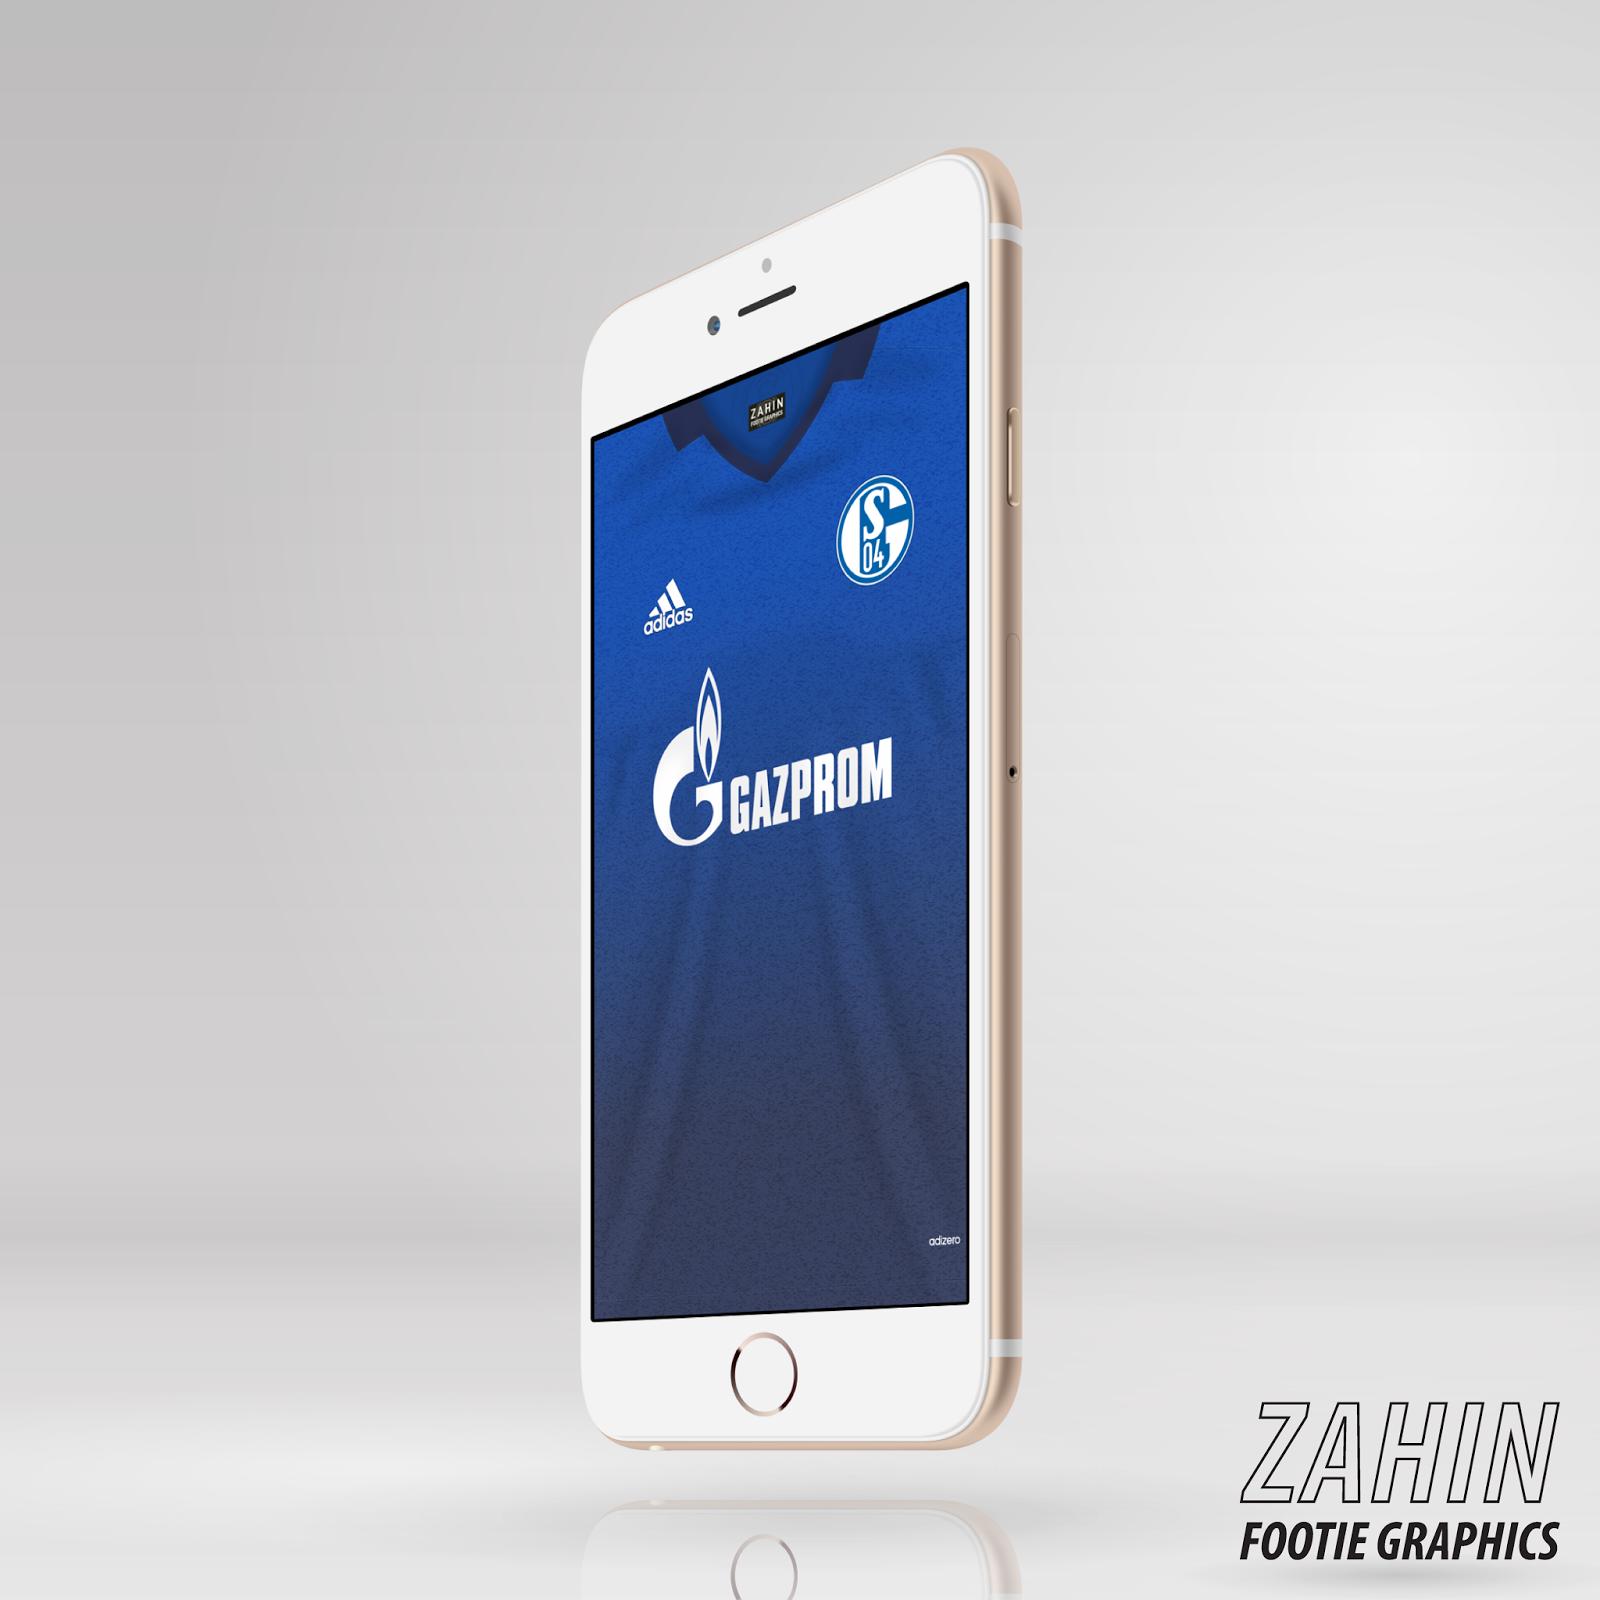 chelsea fc wallpaper iphone 5